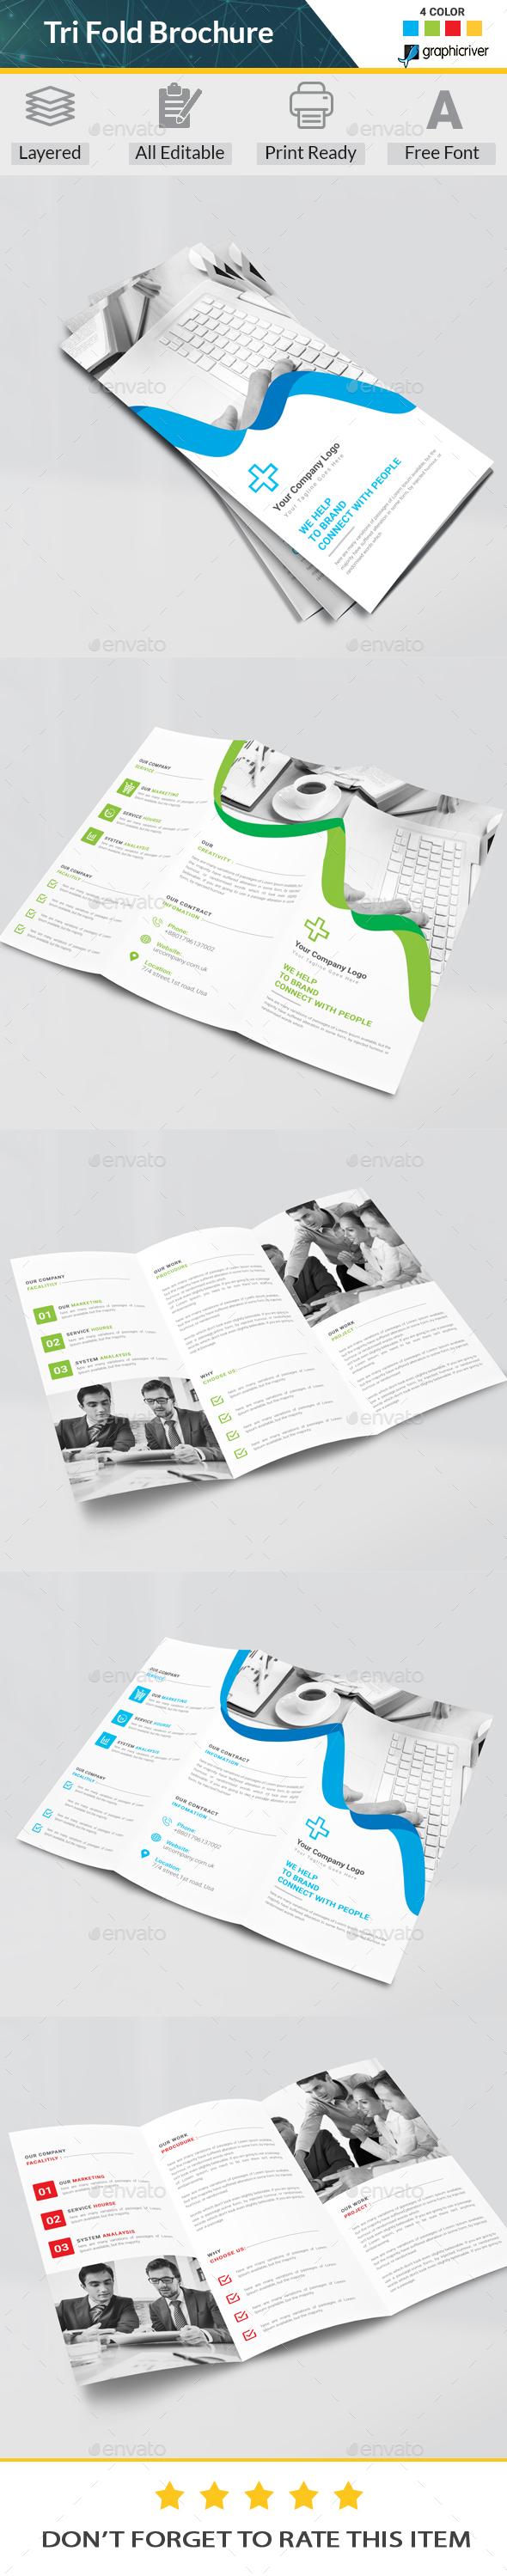 tri fold brochure photoshop psd business brochure brochure